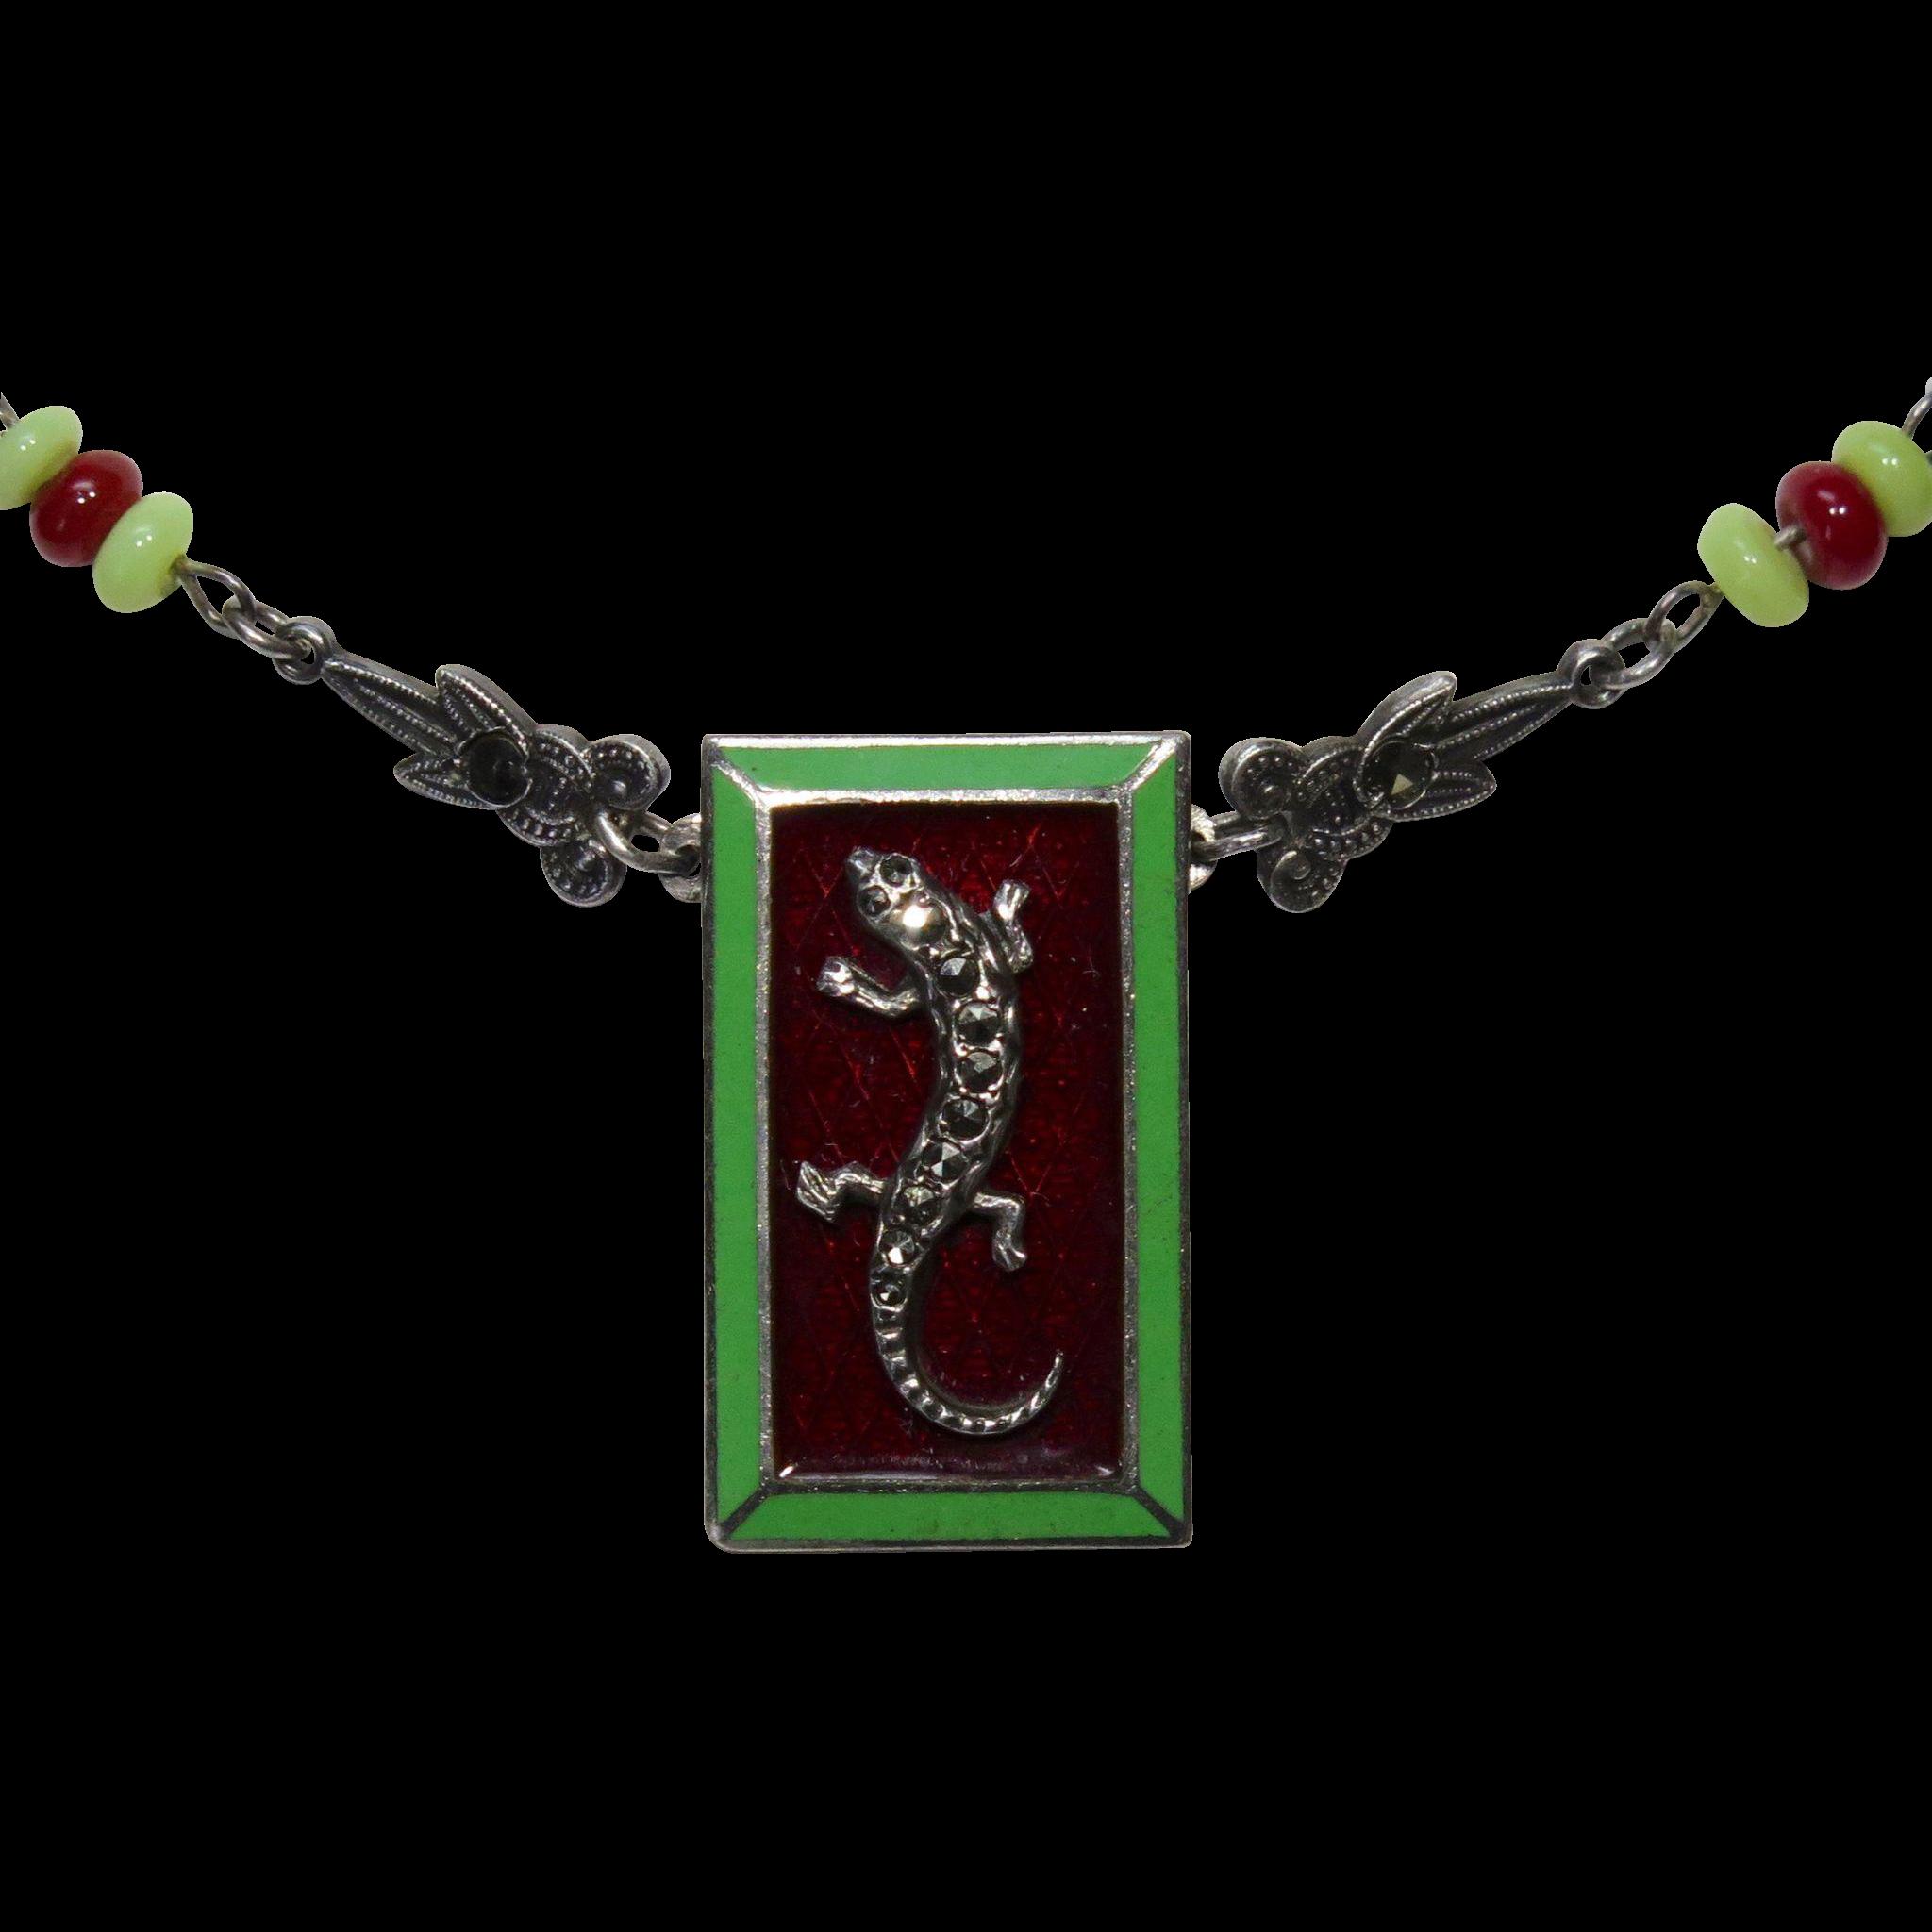 Art Deco Sterling Silver Enamel & Marcasite Gecko Lizard Pendant Necklace Conversion Piece